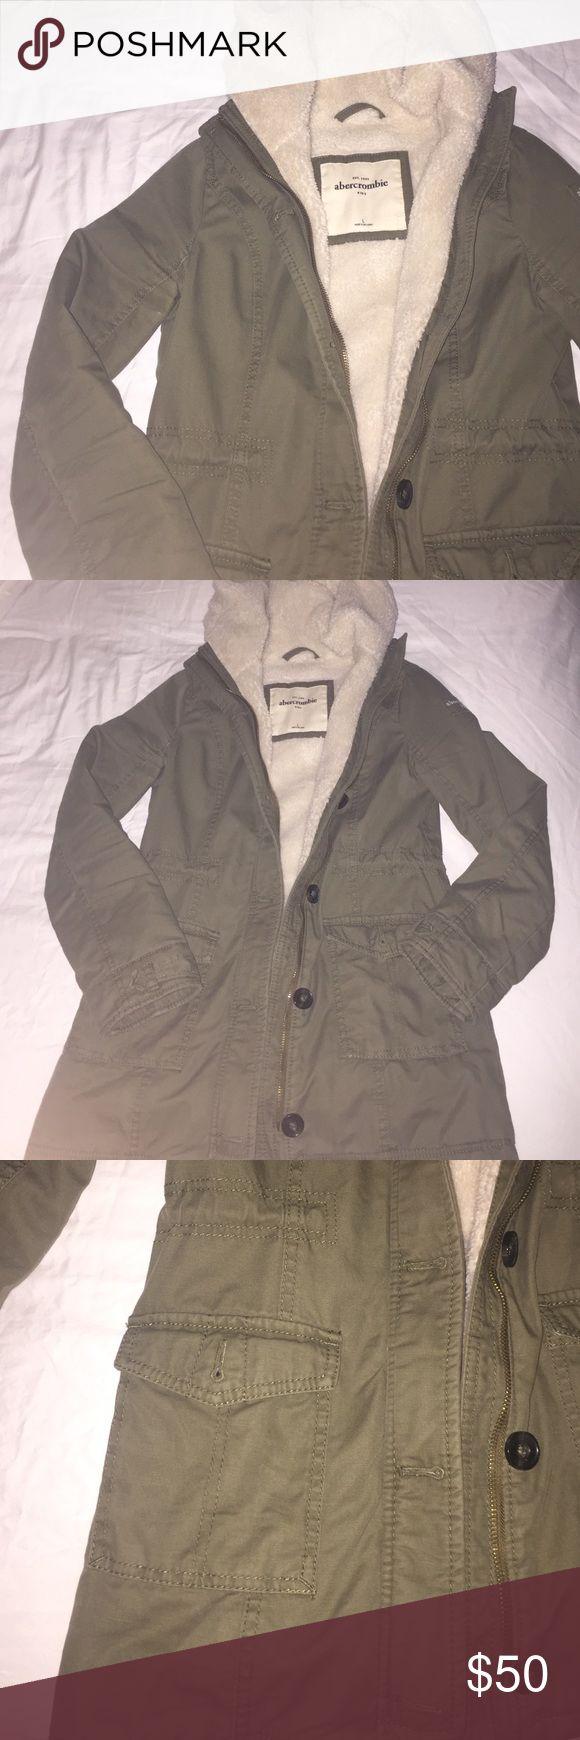 Abercrombie Kids winter jacket Abercrombie kids. Winter jacket. Super thick and warm. Warm lining. Many pockets. No flaws abercrombie kids Jackets & Coats